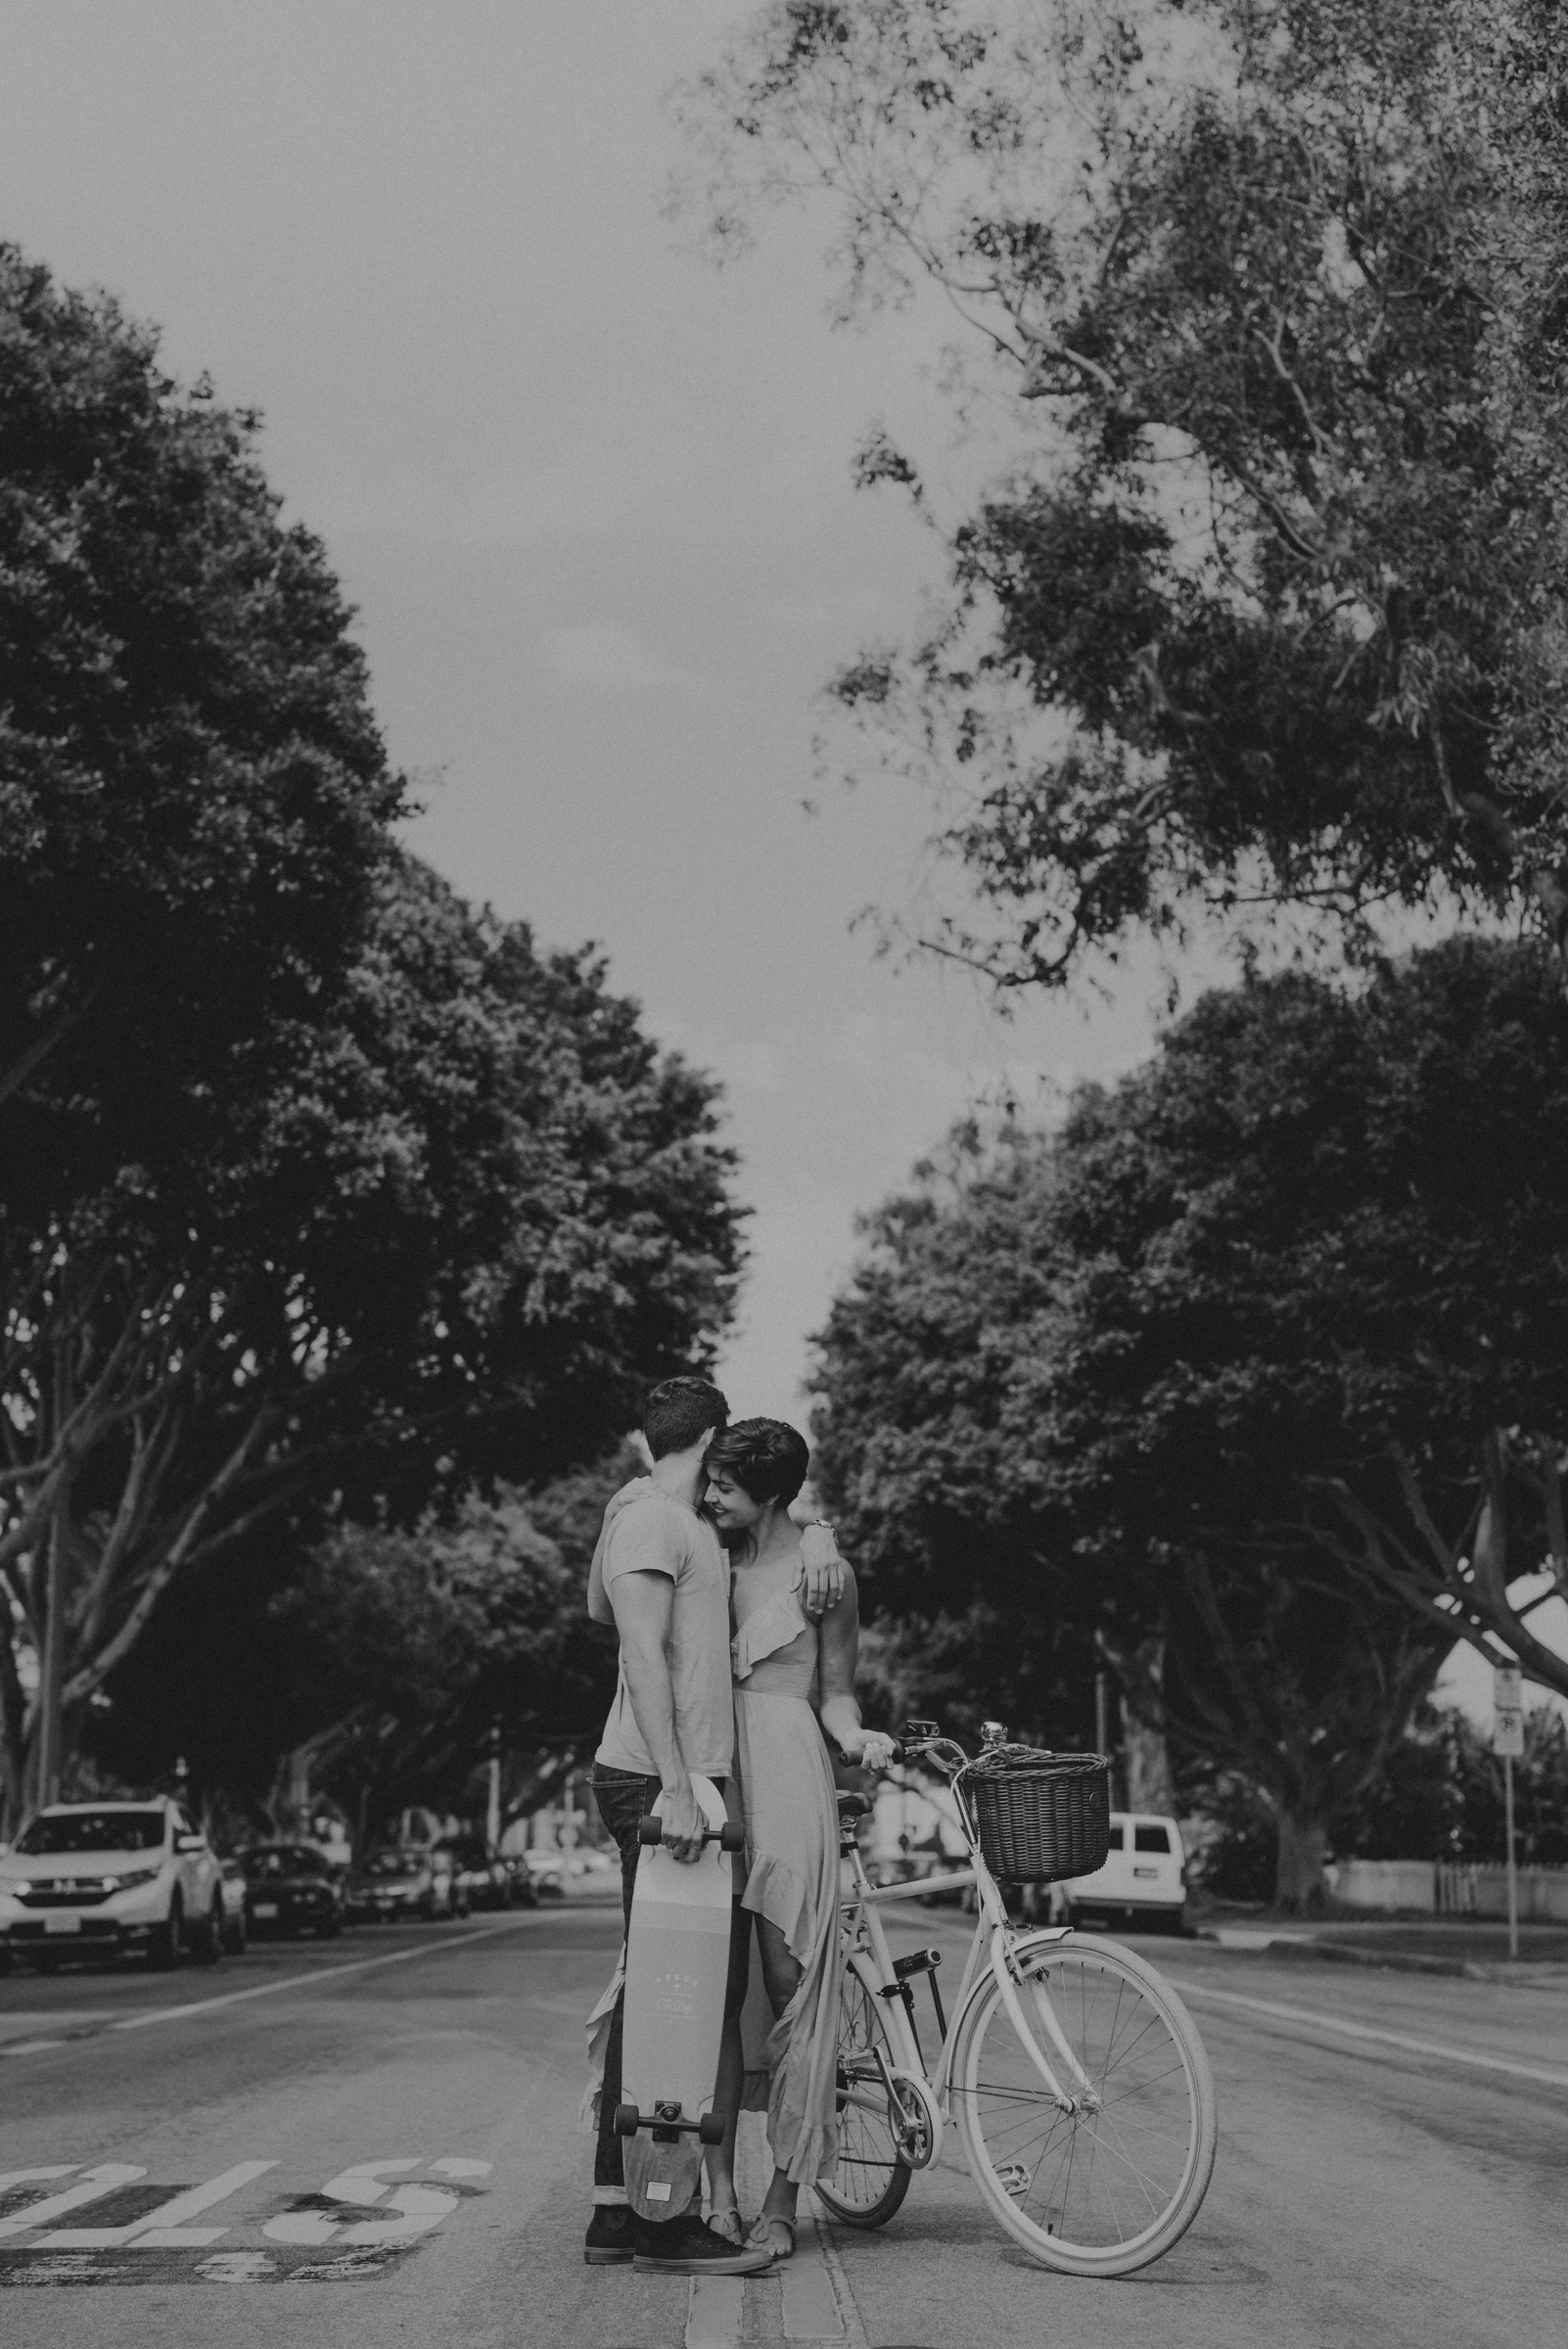 Isaiah + Taylor Photography - Venice Beach & Santa Monica Engagement Session, Los Angeles Wedding Photographer-017.jpg